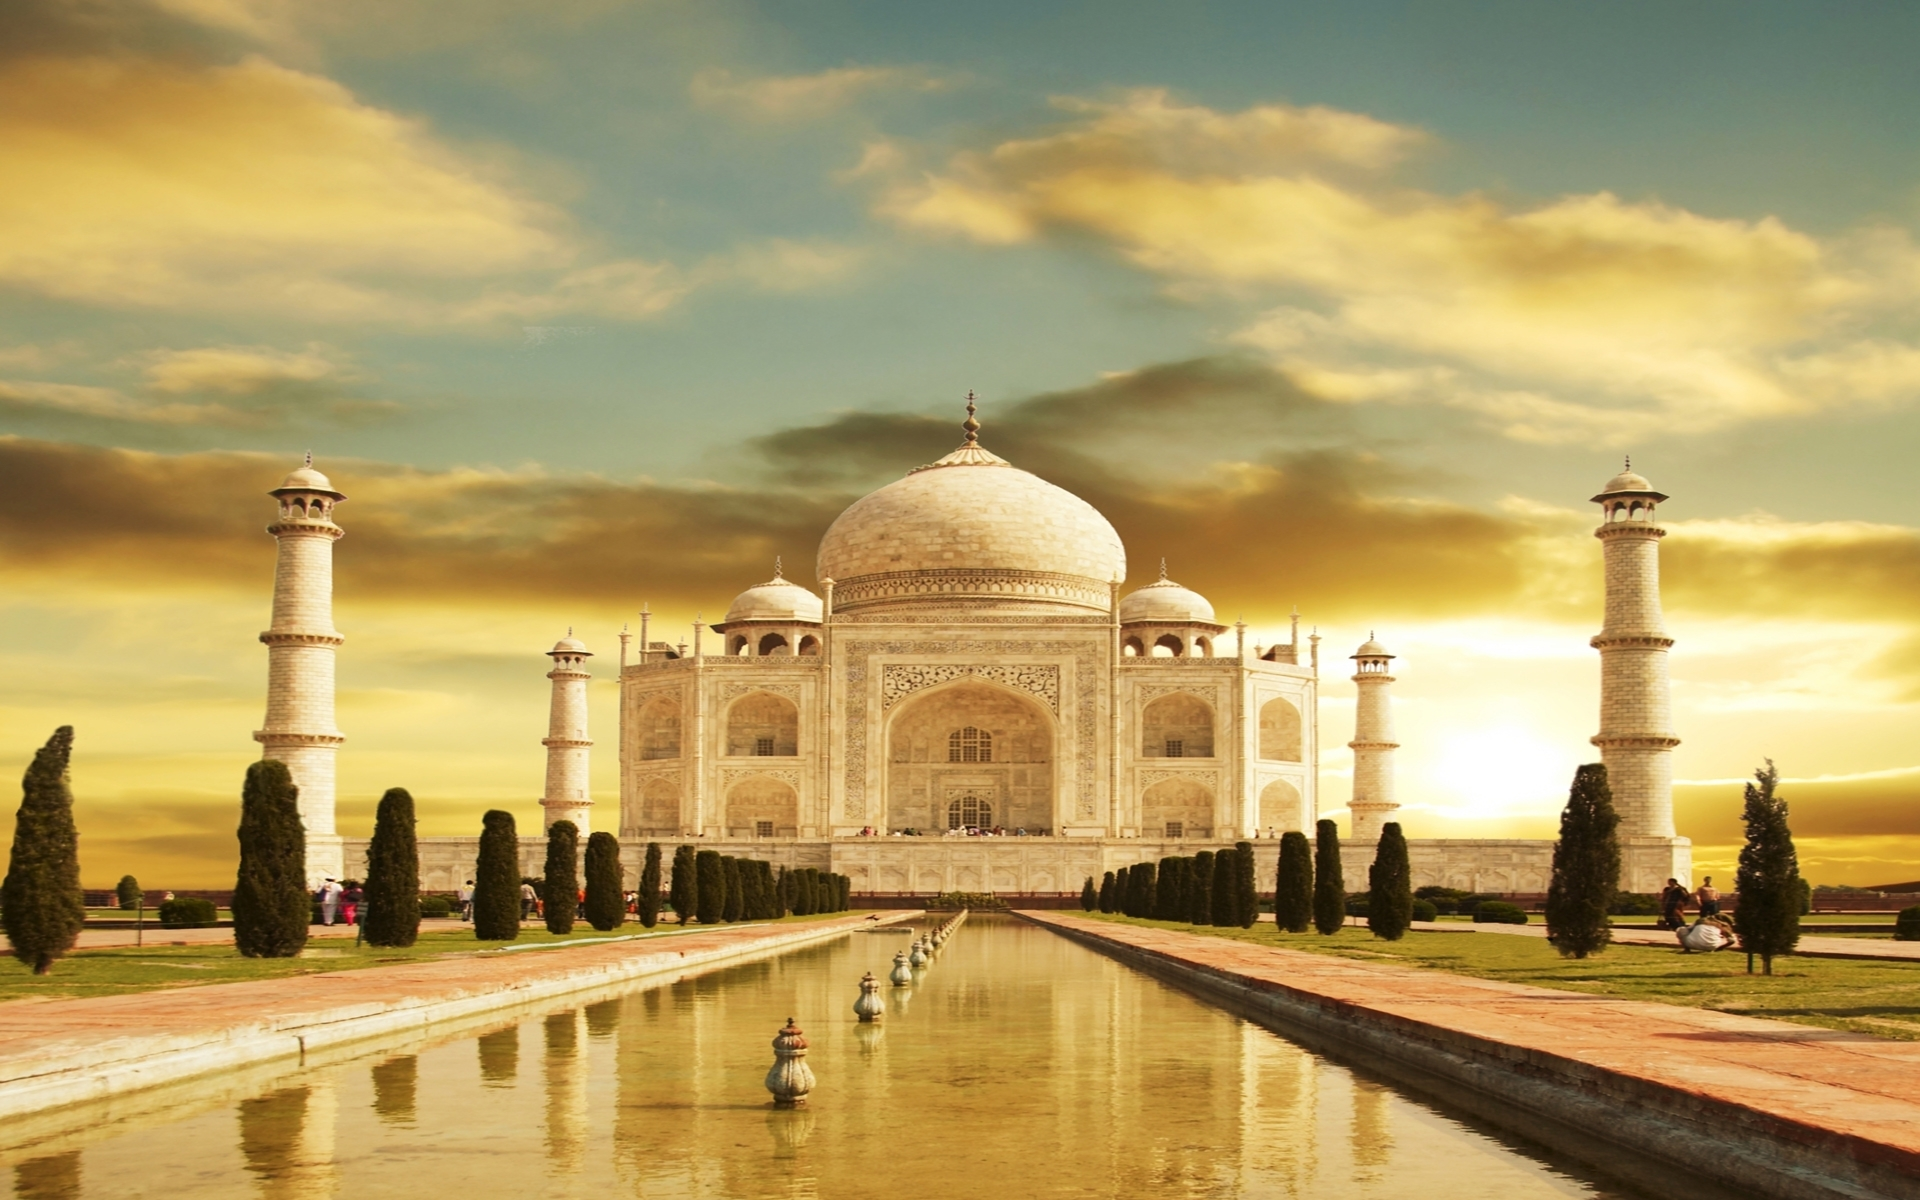 9471 скачать обои Пейзаж, Архитектура, Тадж Махал (Taj Mahal) - заставки и картинки бесплатно